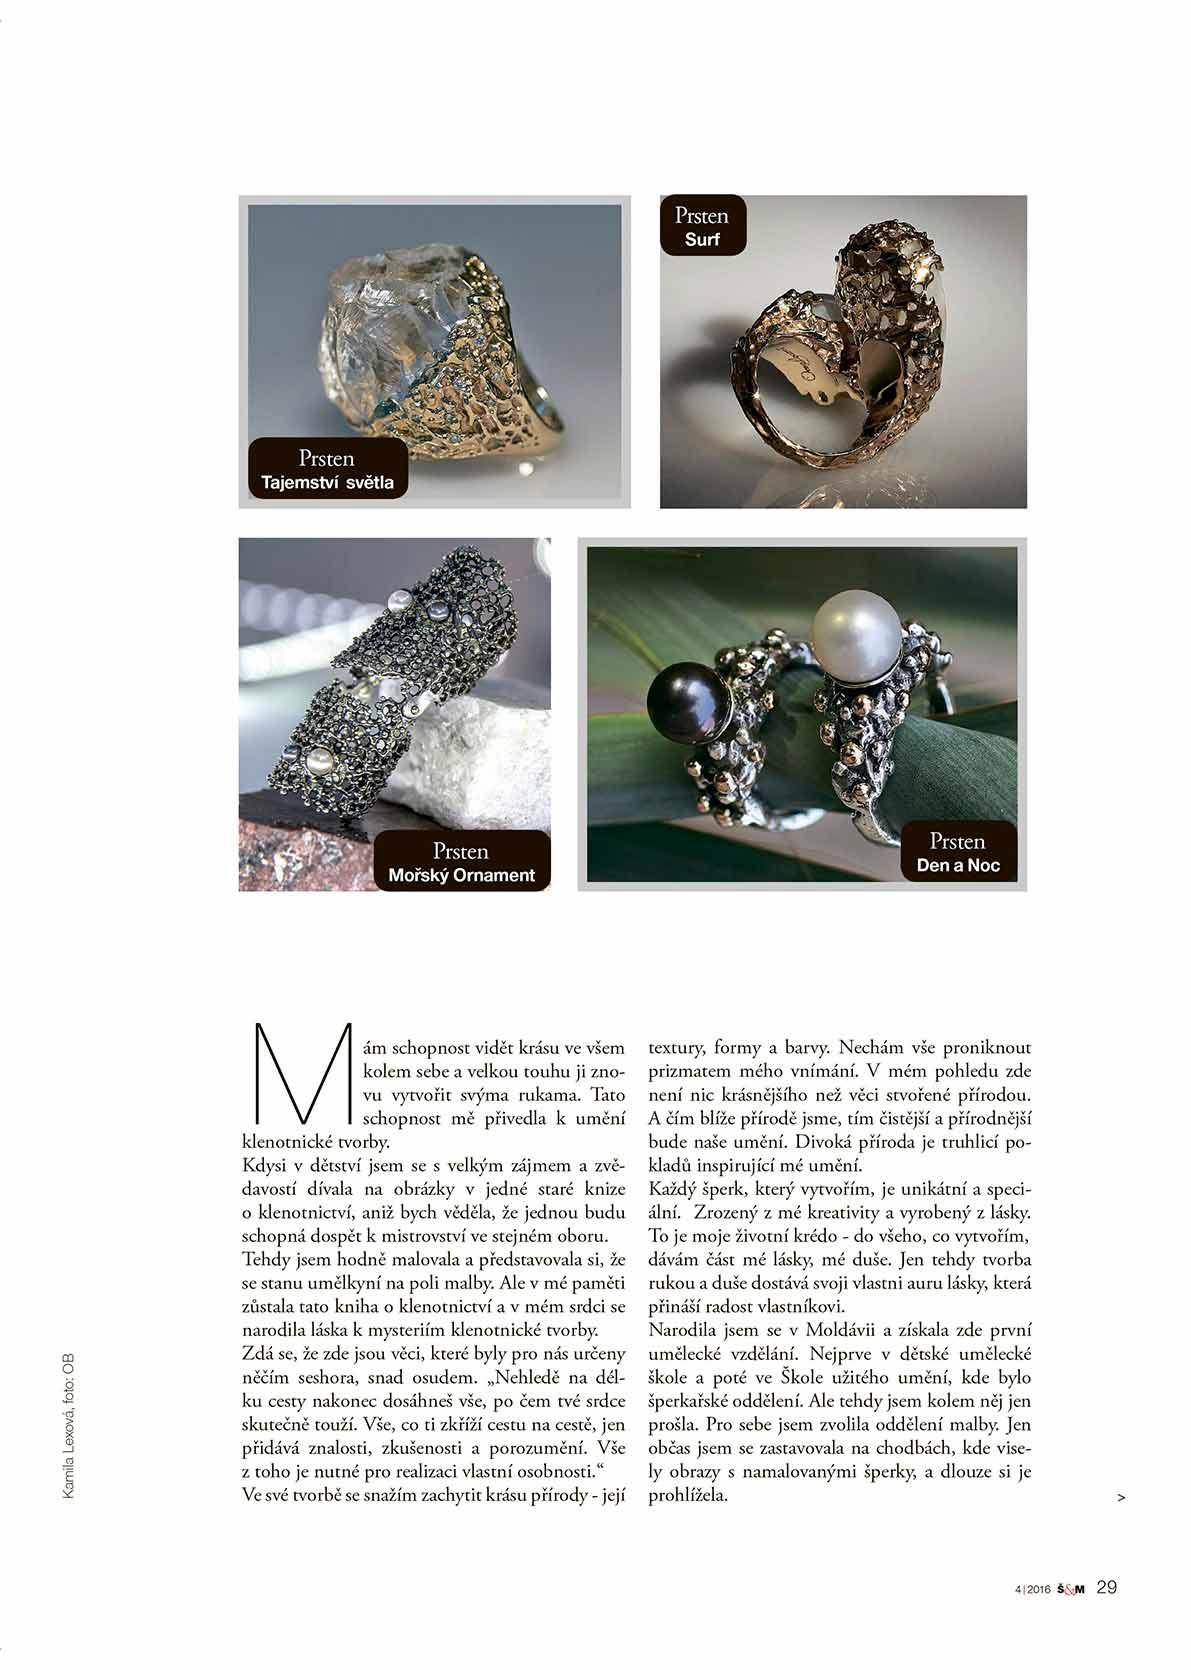 Sperk&Moda_04_2016_Omalgami-Olga-Beleacova-jeweler-Exclusive-Jewelry-Silver-diamond